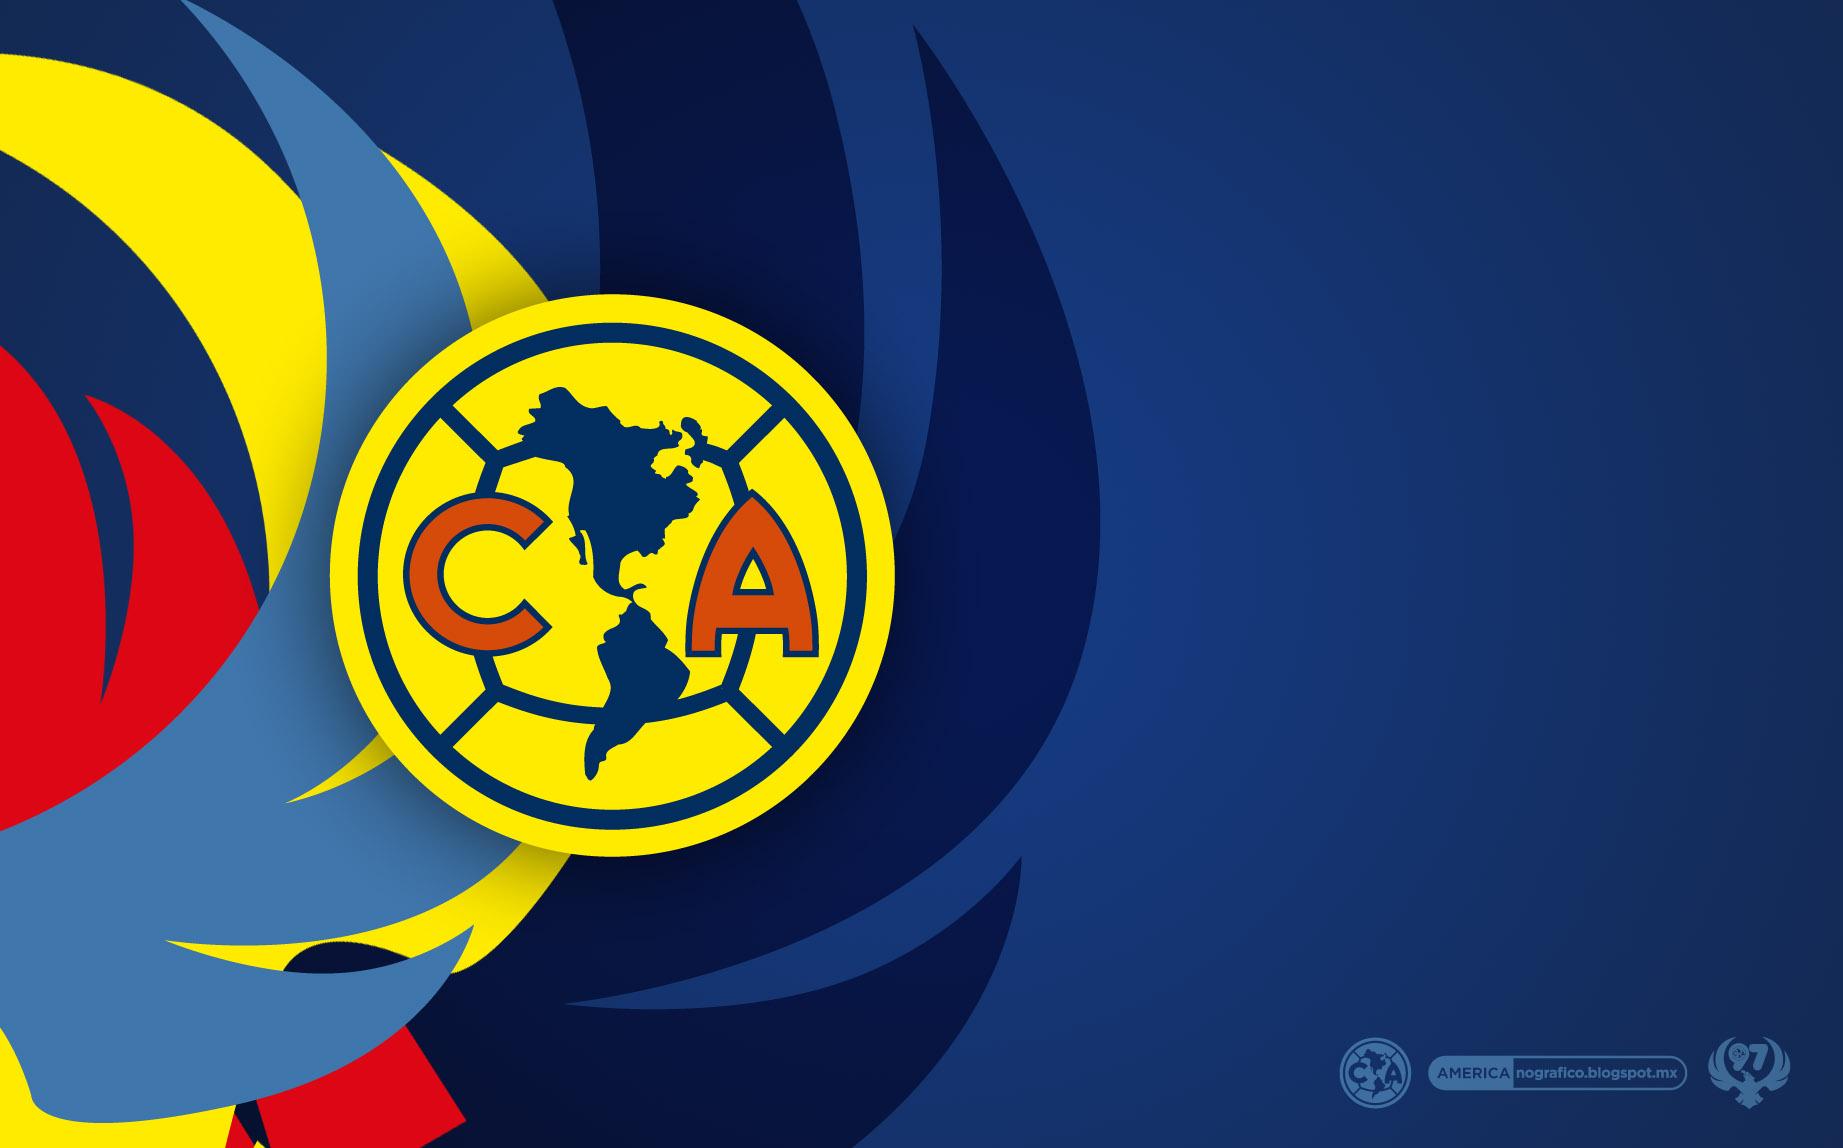 Club America Wallpapers | PixelsTalk Net